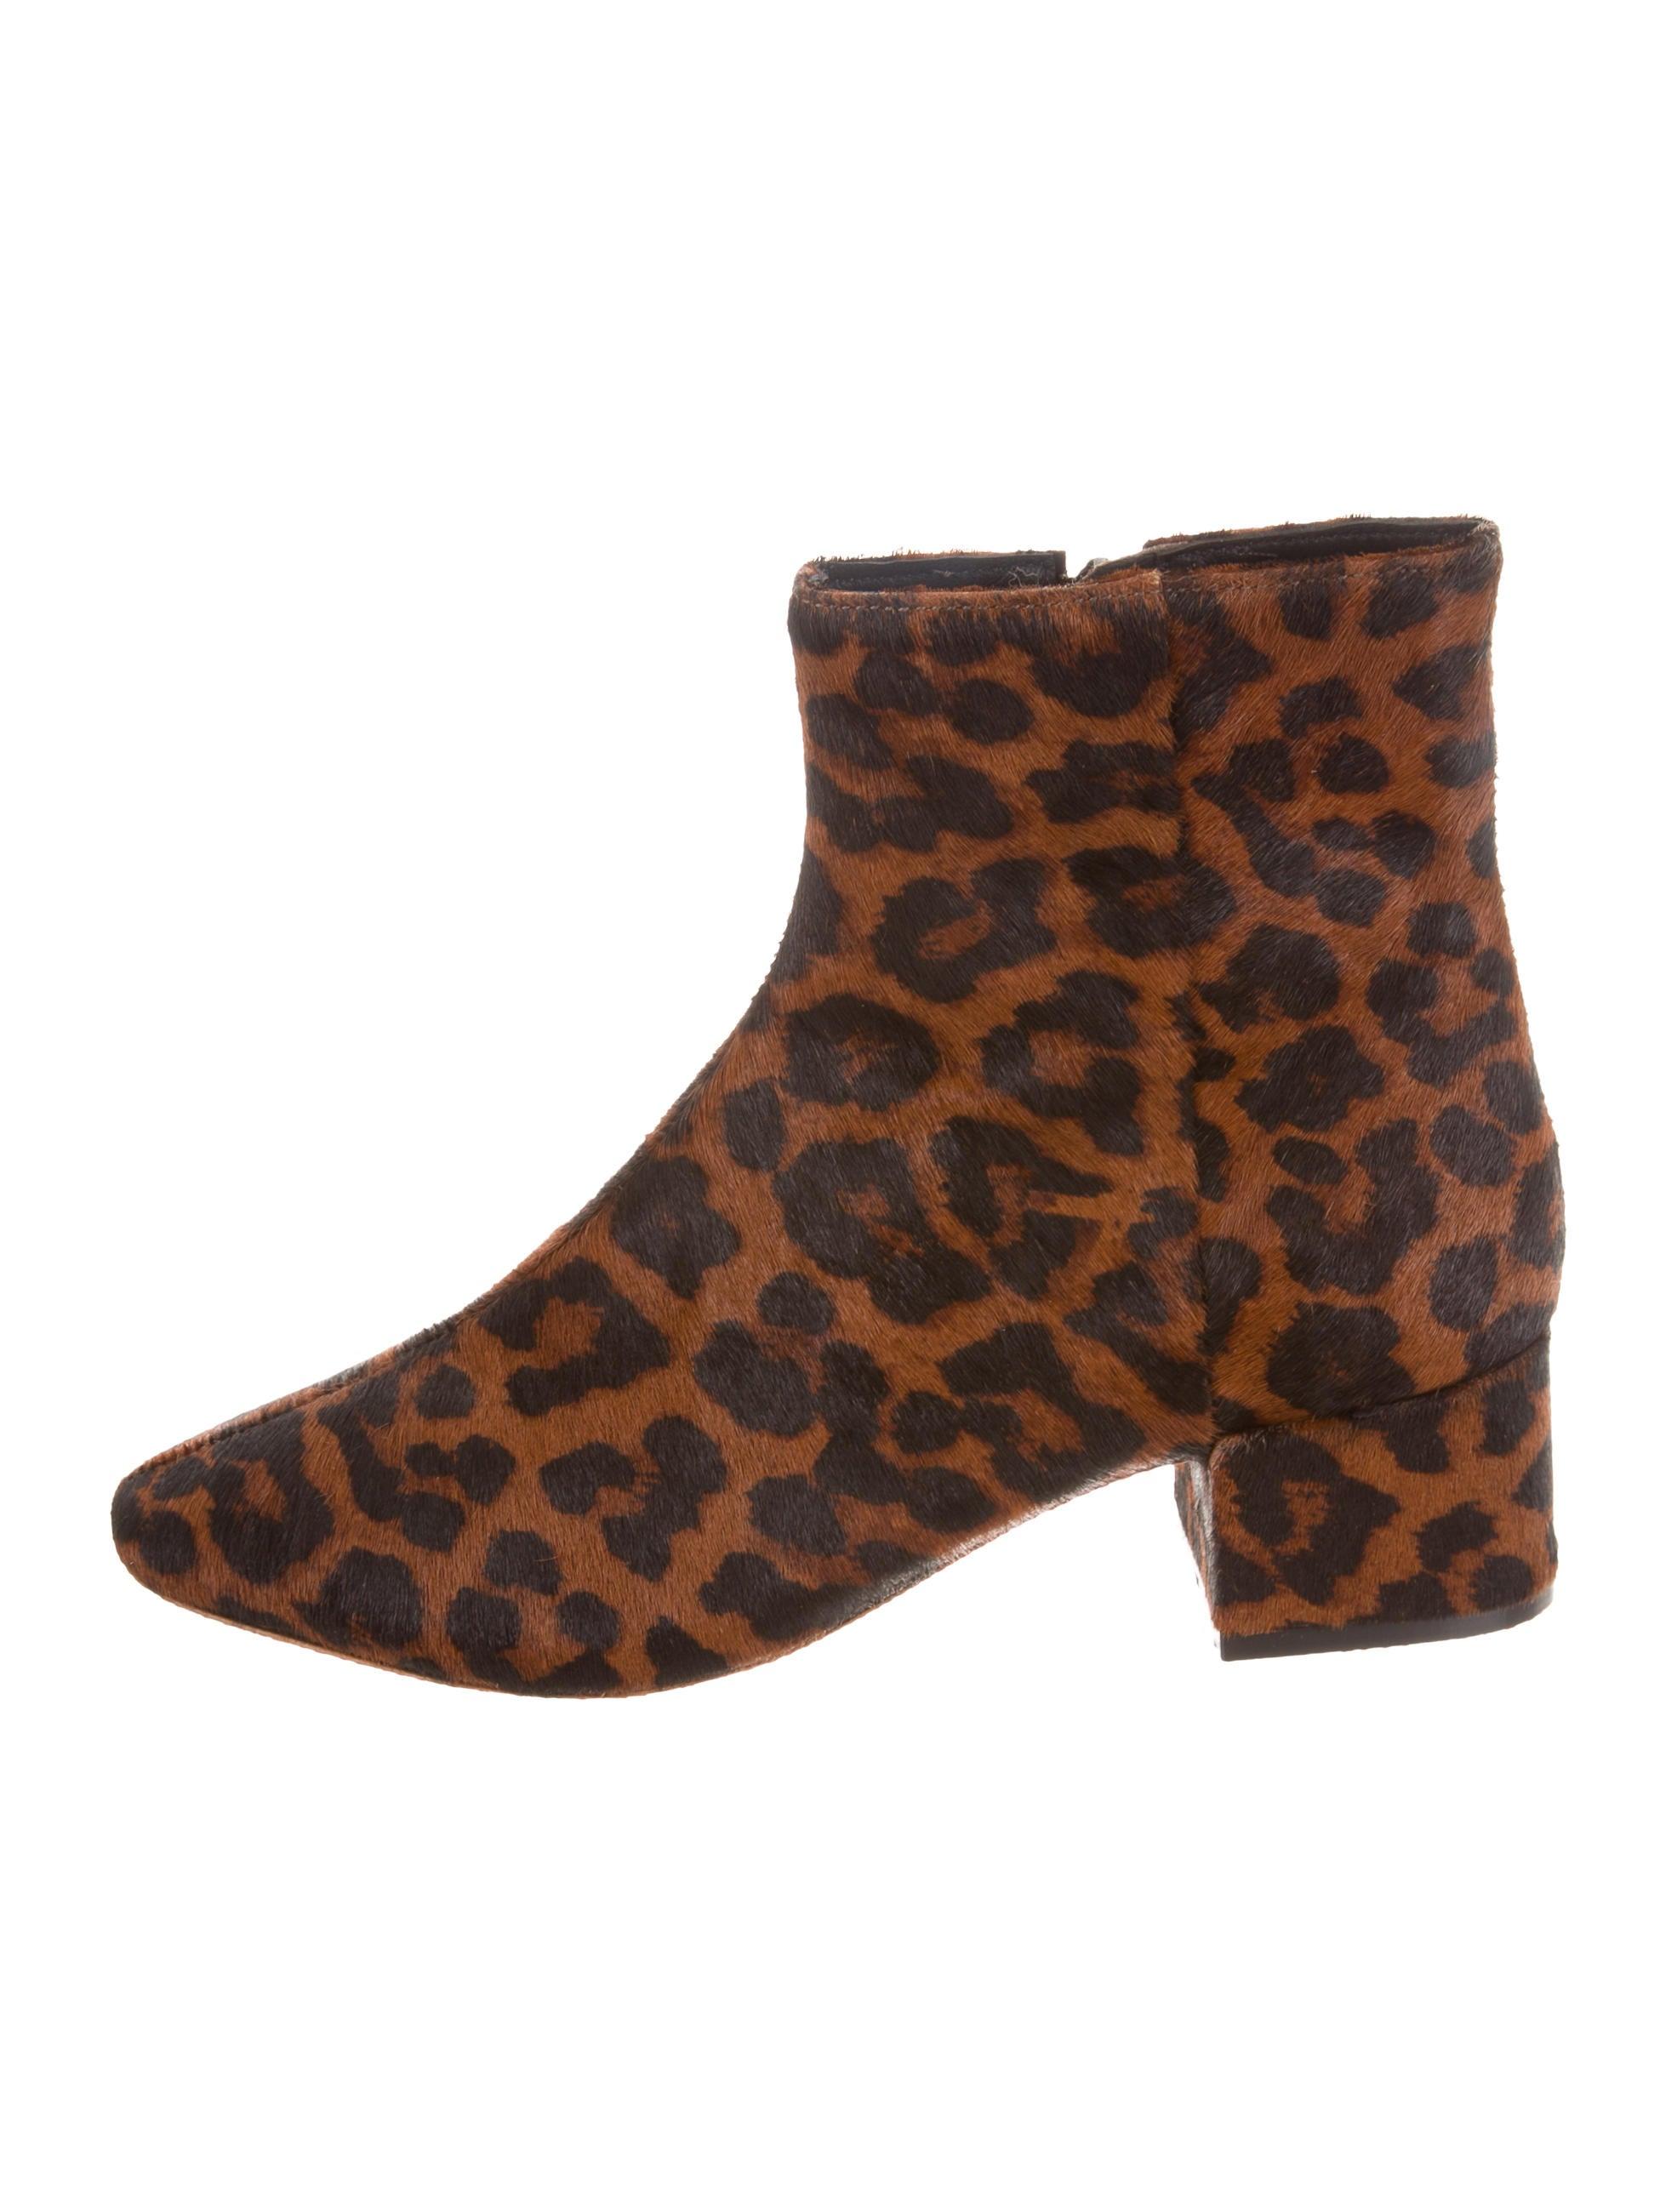 Loeffler Randall Burgundy Suede Ankle Boots dif7DwrnoI